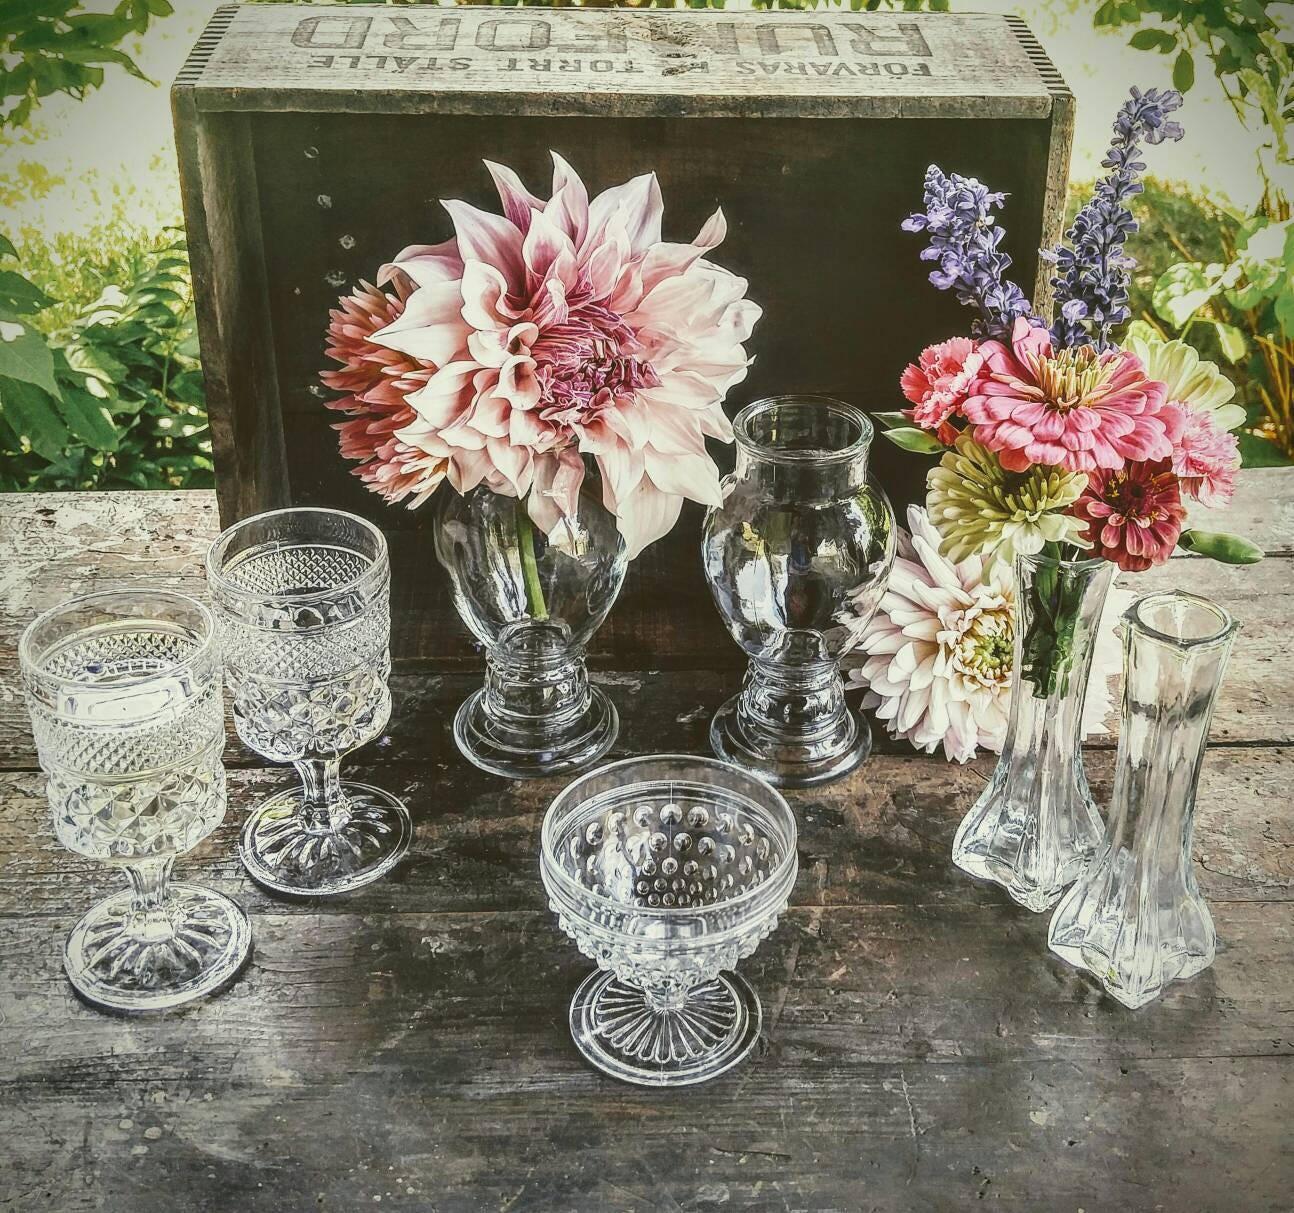 Vintage Wedding Vases Clear Glass Sparkle And Shine Celebration Seven Piece